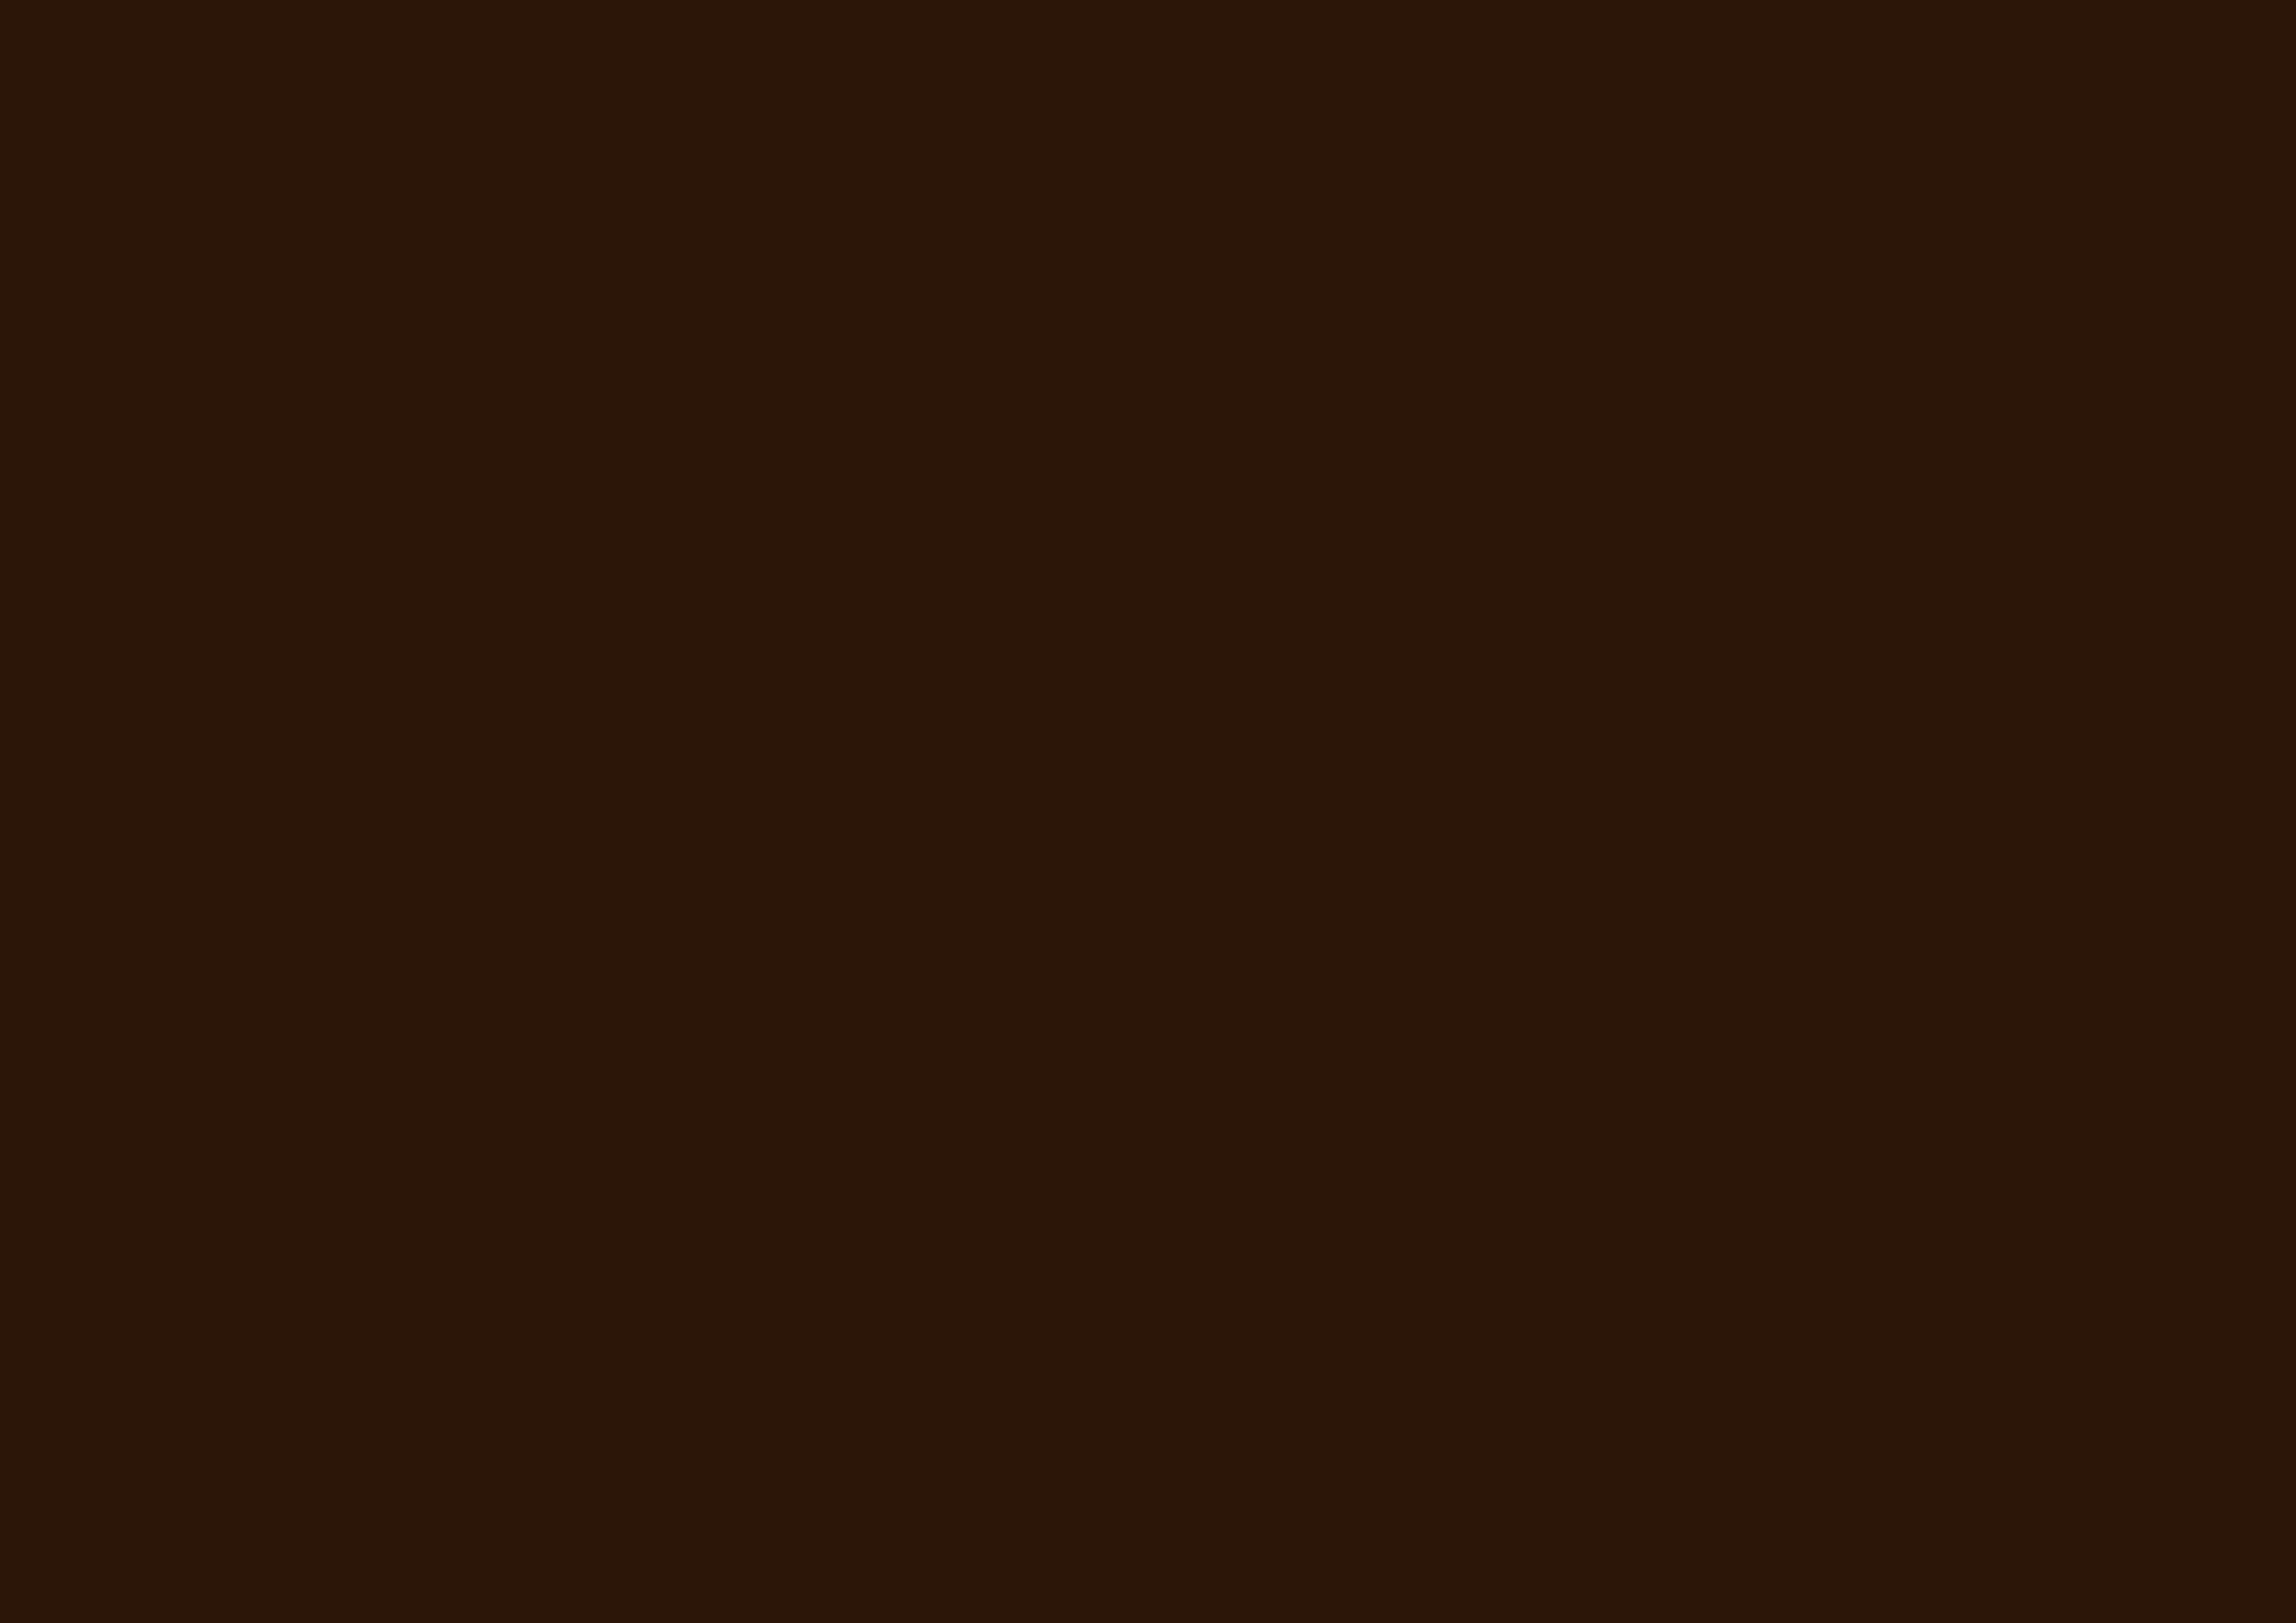 3508x2480 Zinnwaldite Brown Solid Color Background